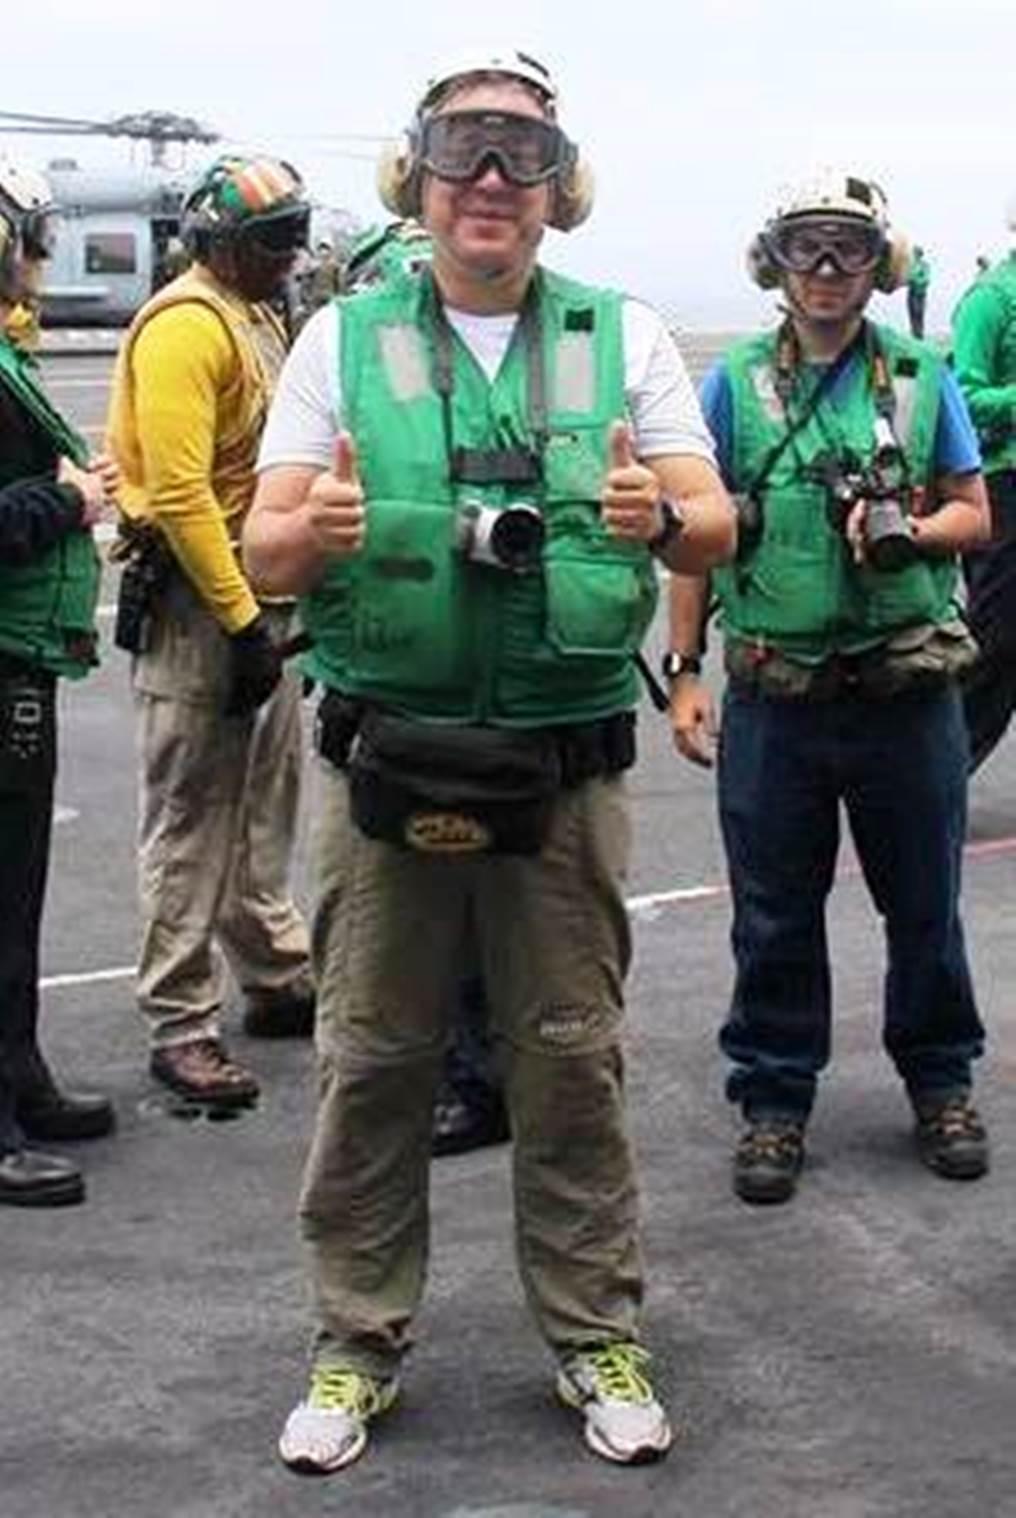 U.S. Carrier USS George Washington: A Boy's Dream Come True